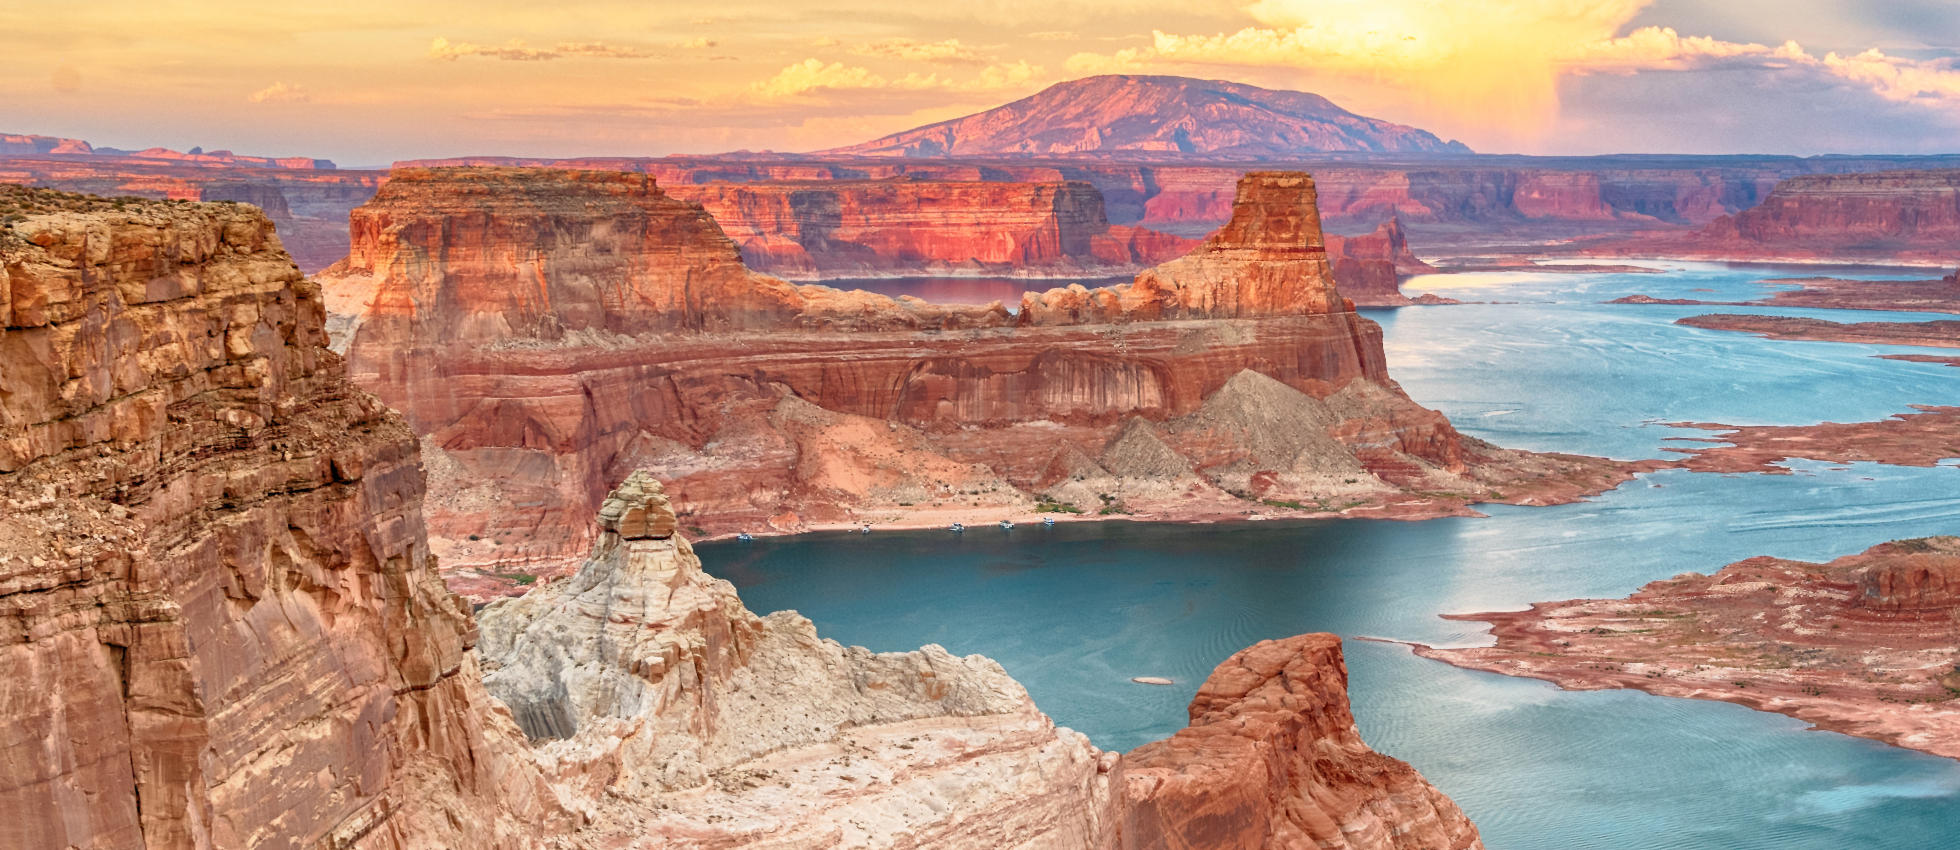 Gap Year Program - ARCC Gap | Southwest: Utah, Colorado, New Mexico, Arizona & California  5